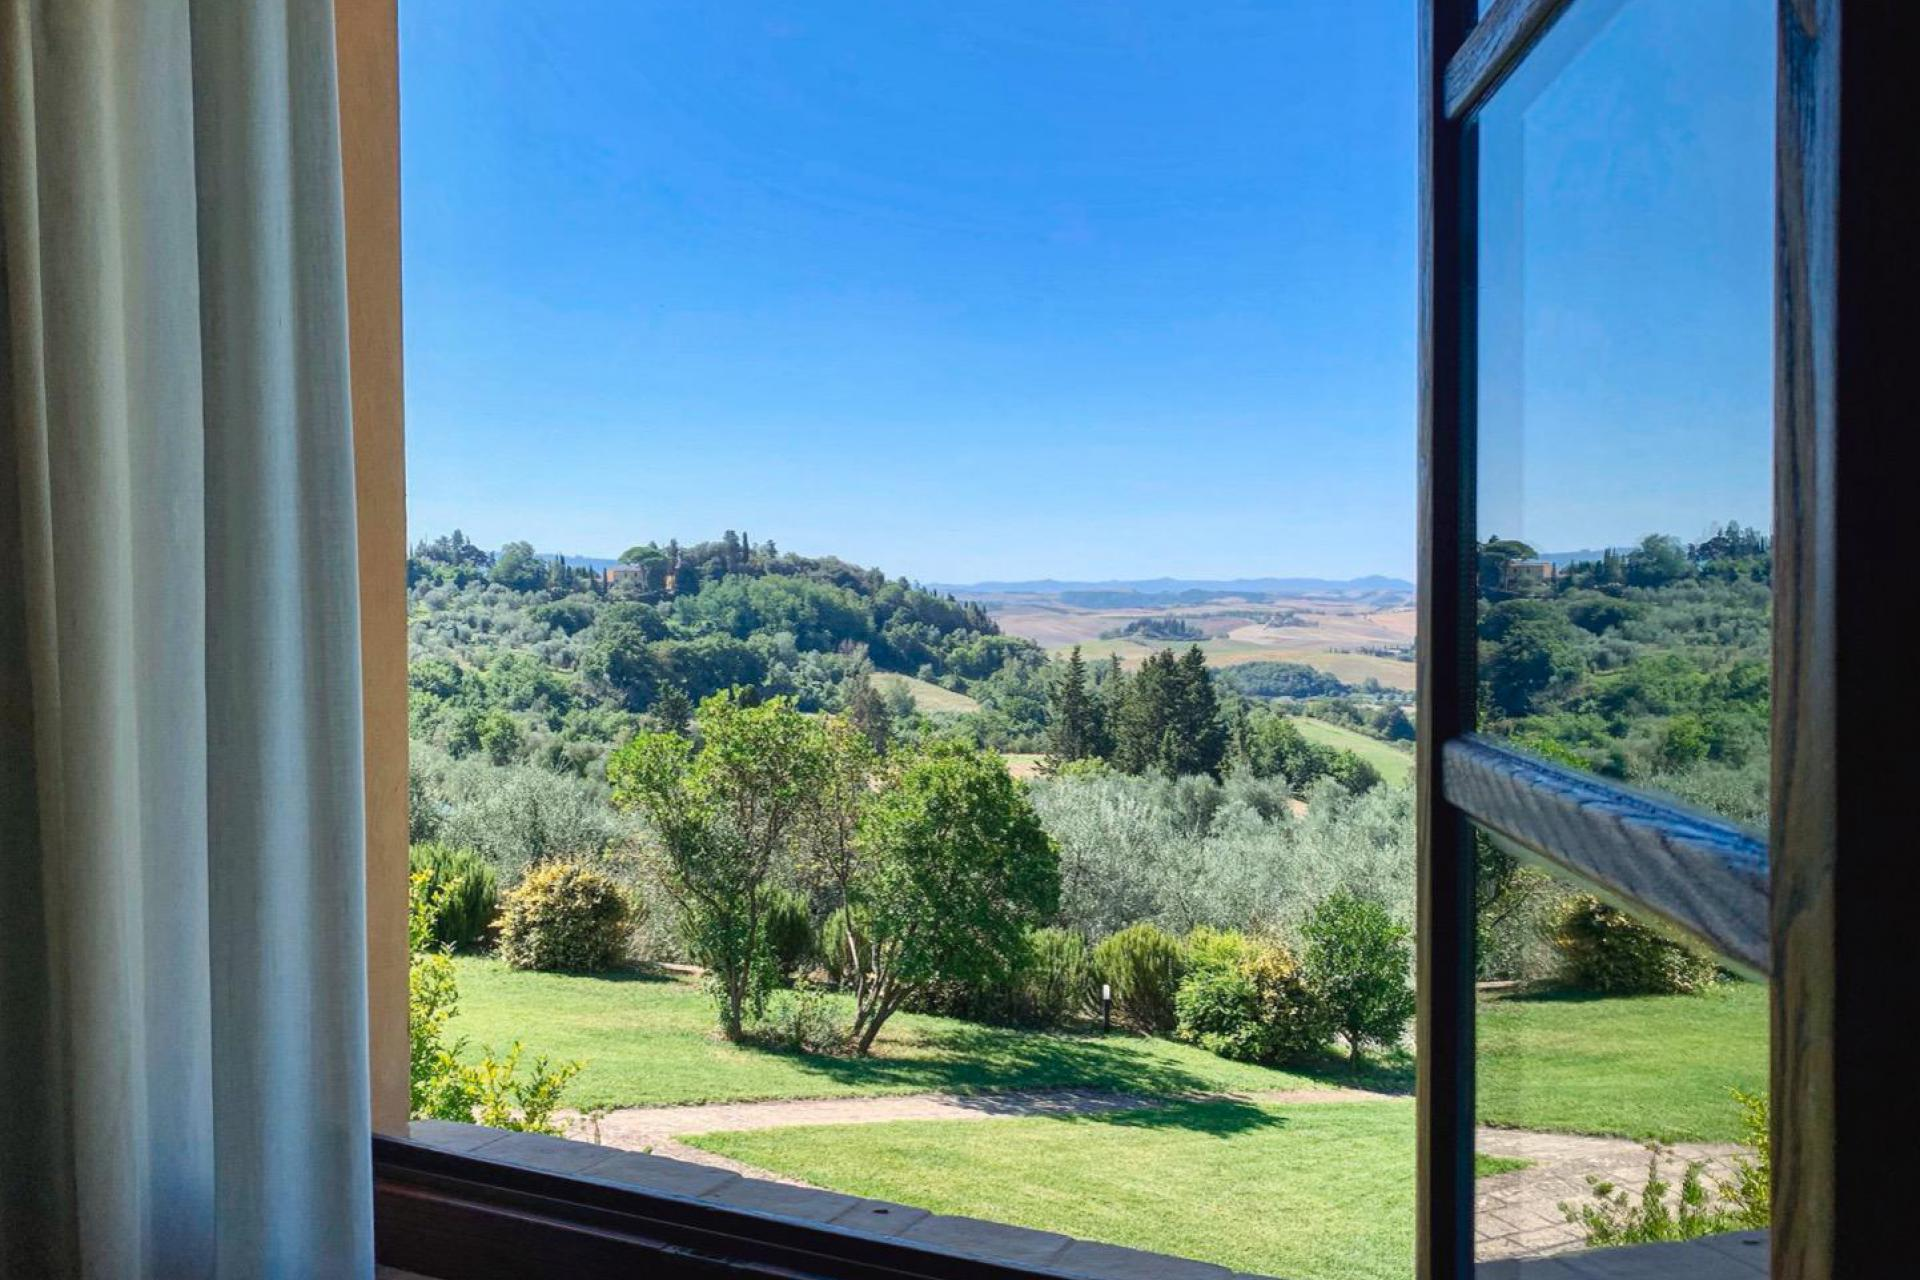 Agriturismo Toscane Rustige agriturismo tussen de wijngaarden in Toscane